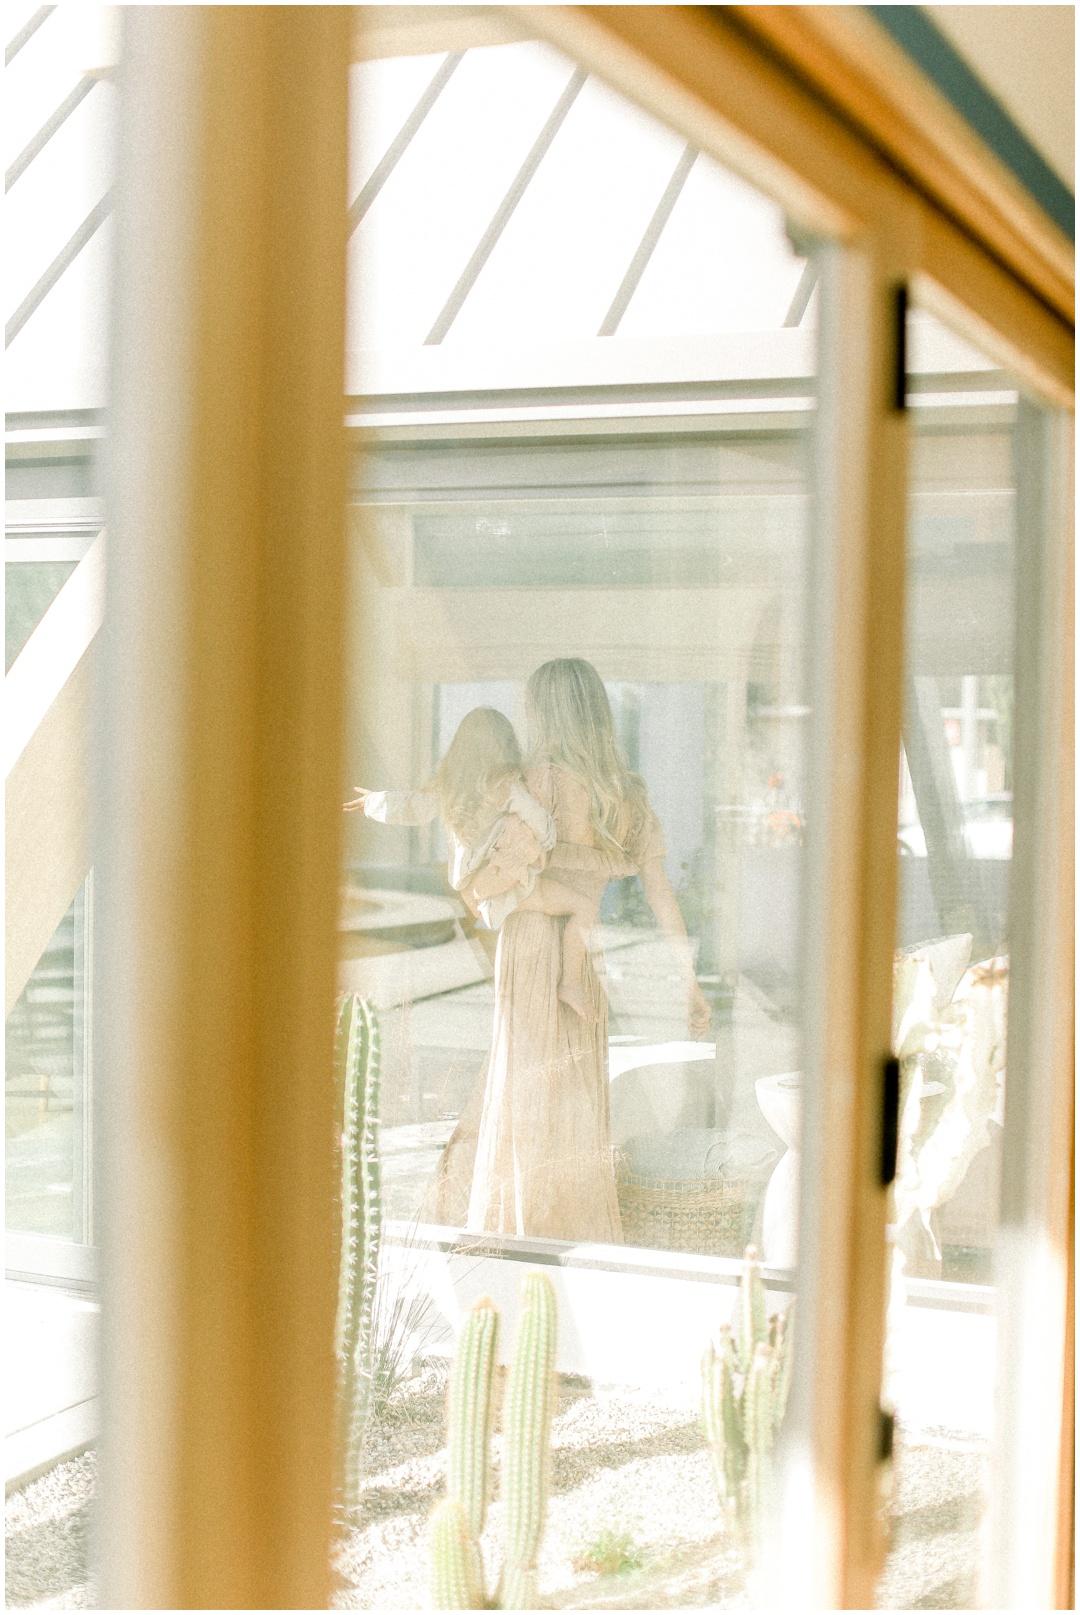 Newport_Beach_Family_Photographer_Newport_Beach_Newborn_Photographer_Orange_County_Family_Photographer_Cori_Kleckner_Photography_Huntington_Beach_San_Clemente_Family_Session_Photography_The_Schwartz_Family_Nicole_Schwartz_2499.jpg